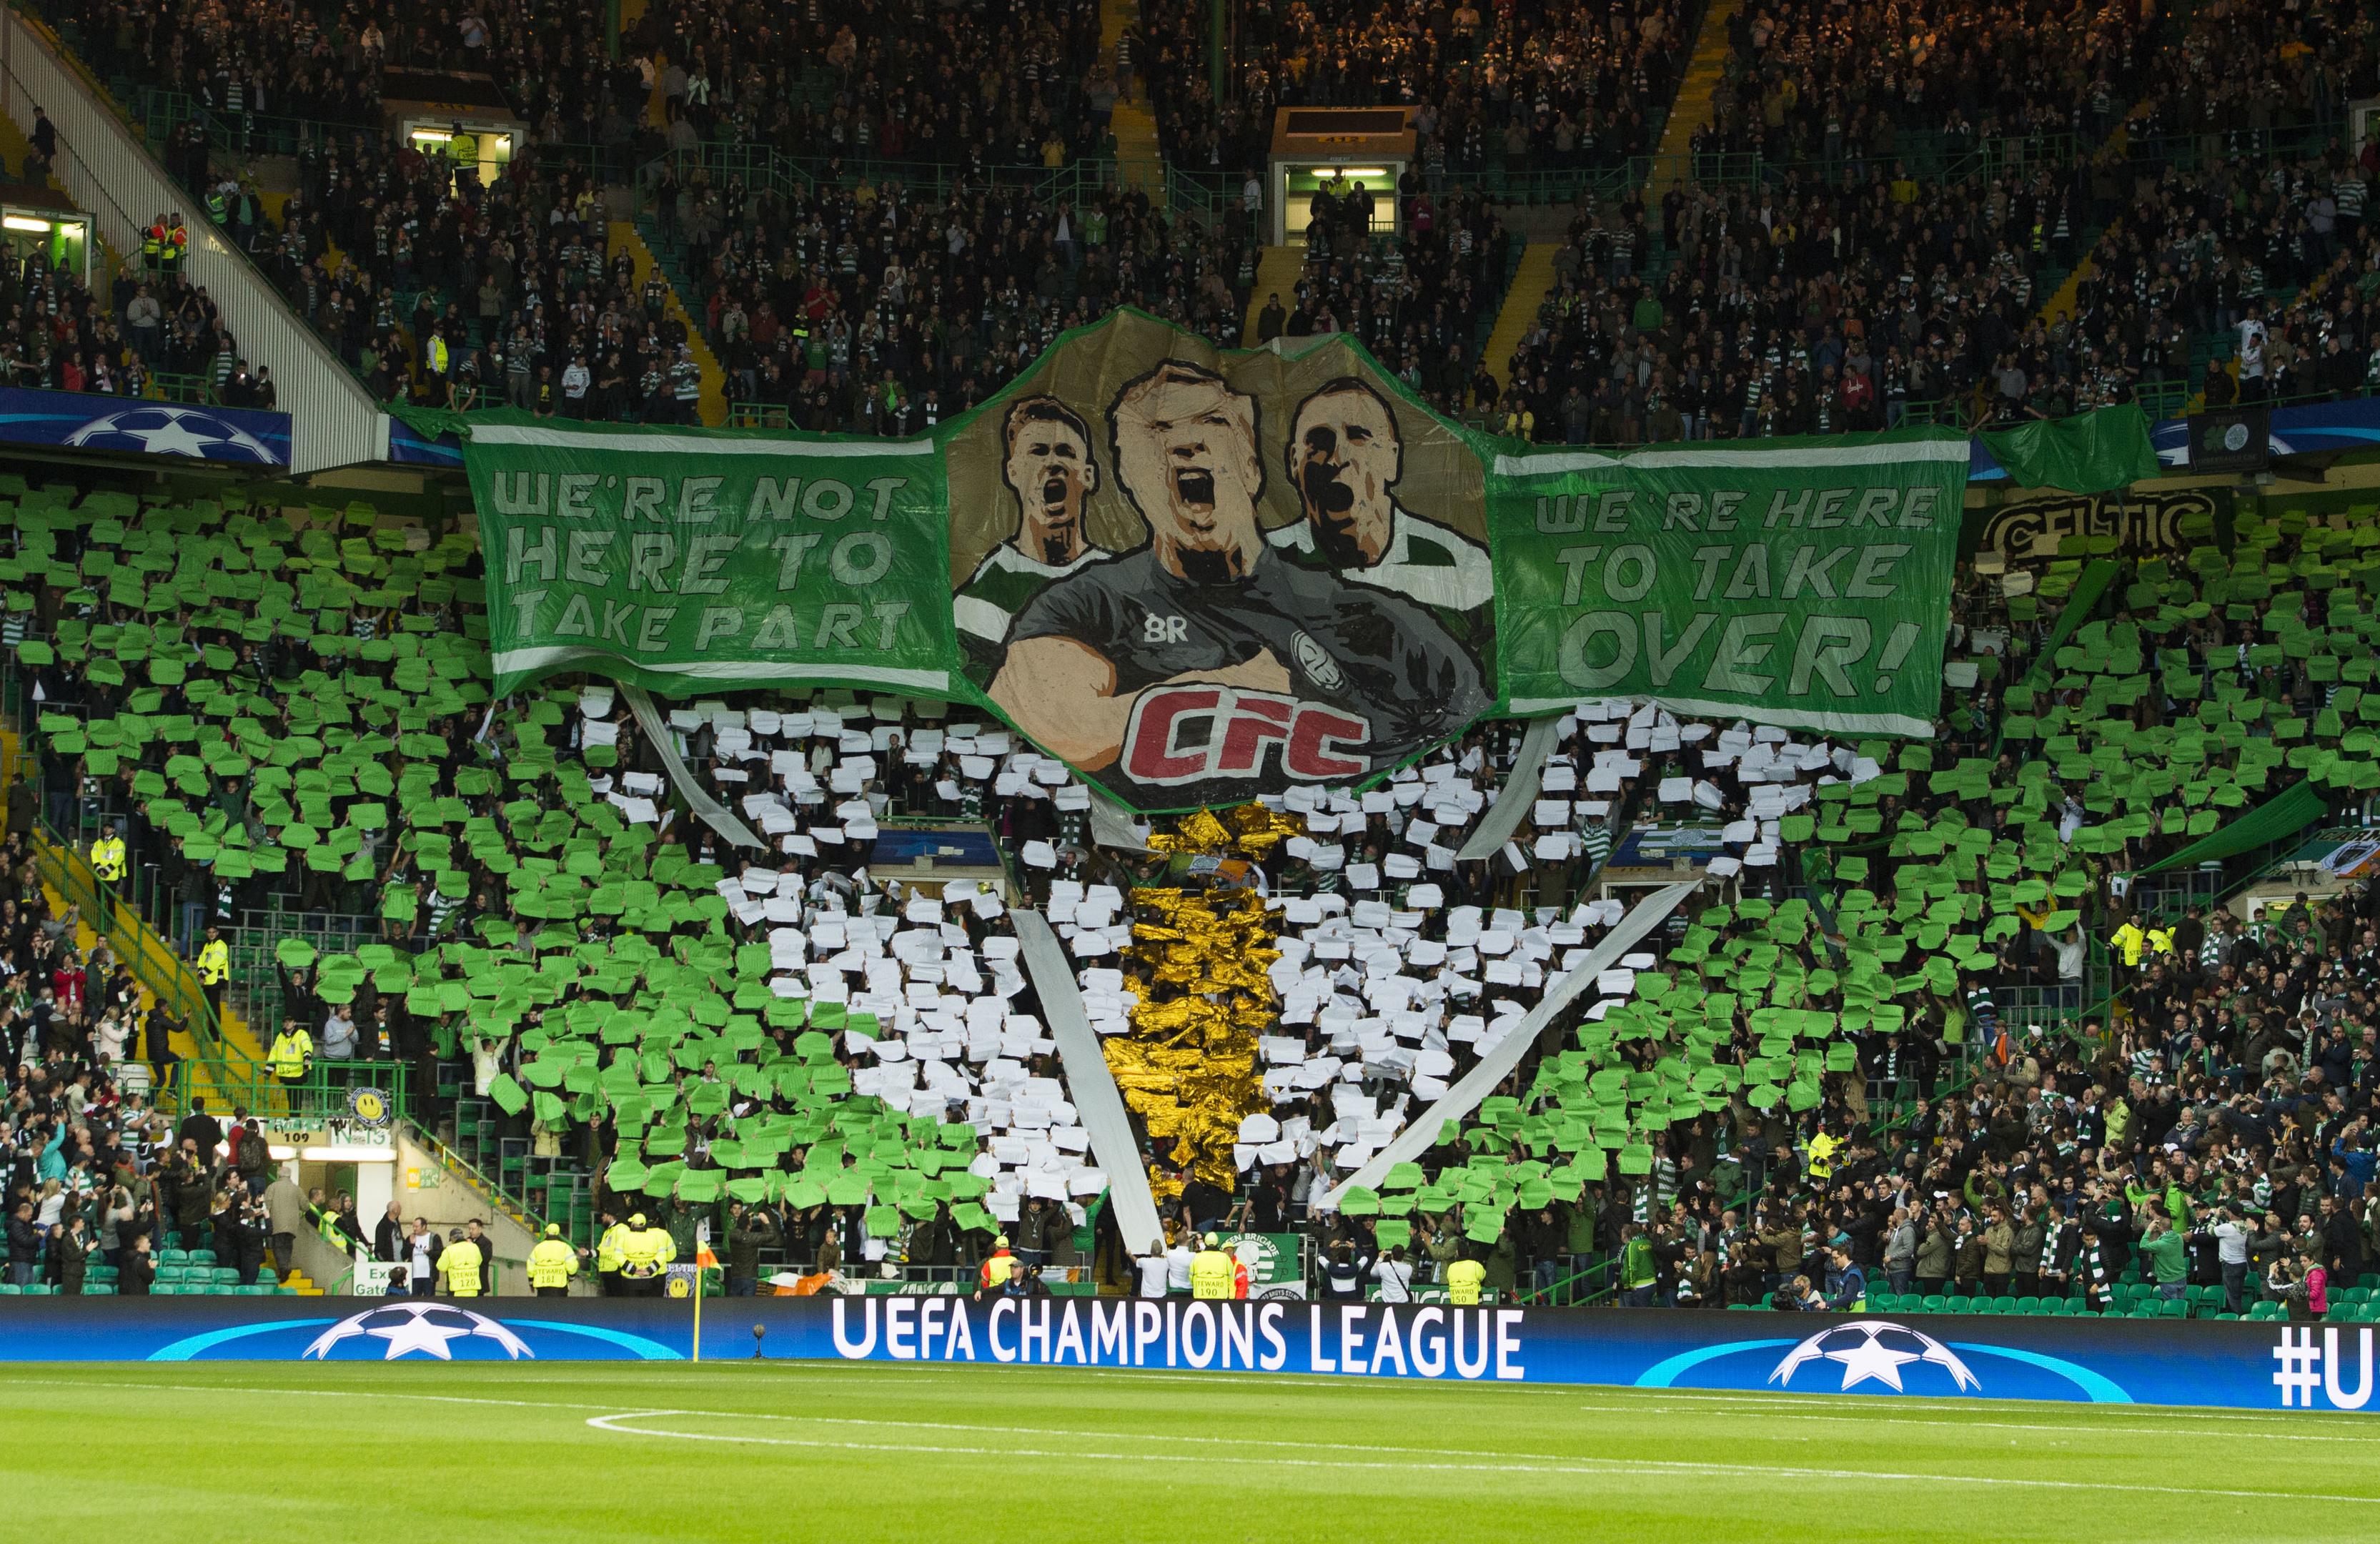 The Green Brigade display at Celtic Park